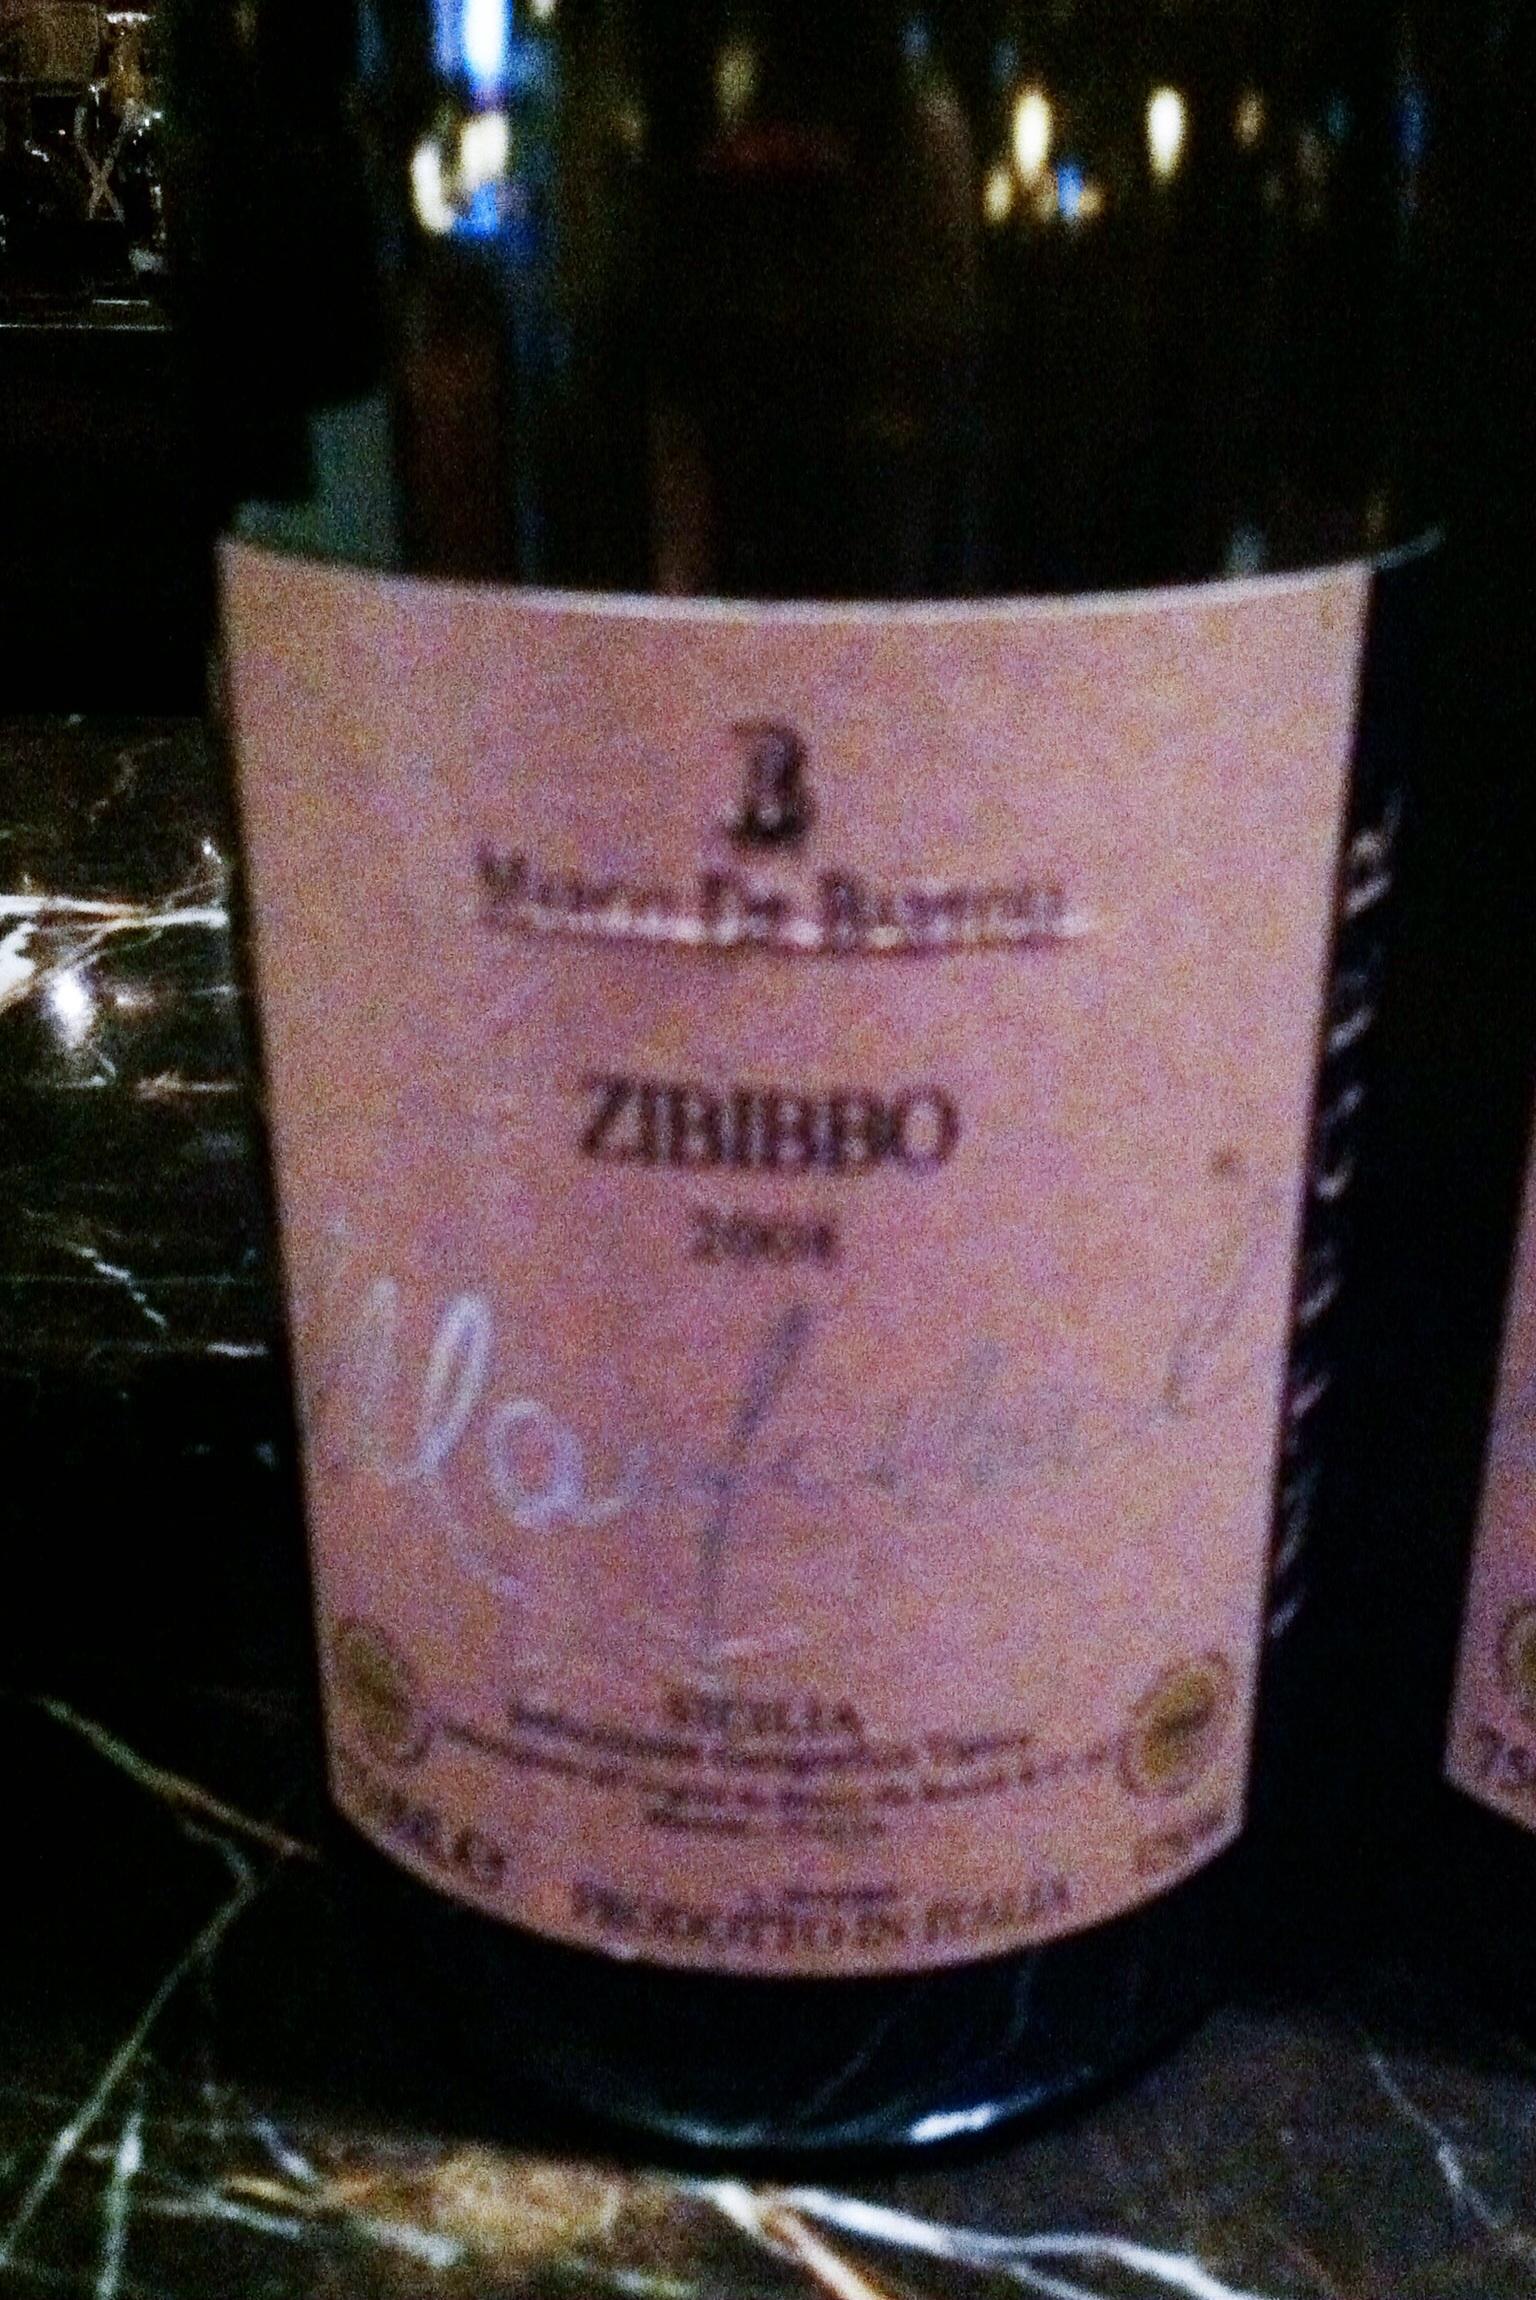 Zibbibo, photo by Shana Sokol of Shana Speaks Wine